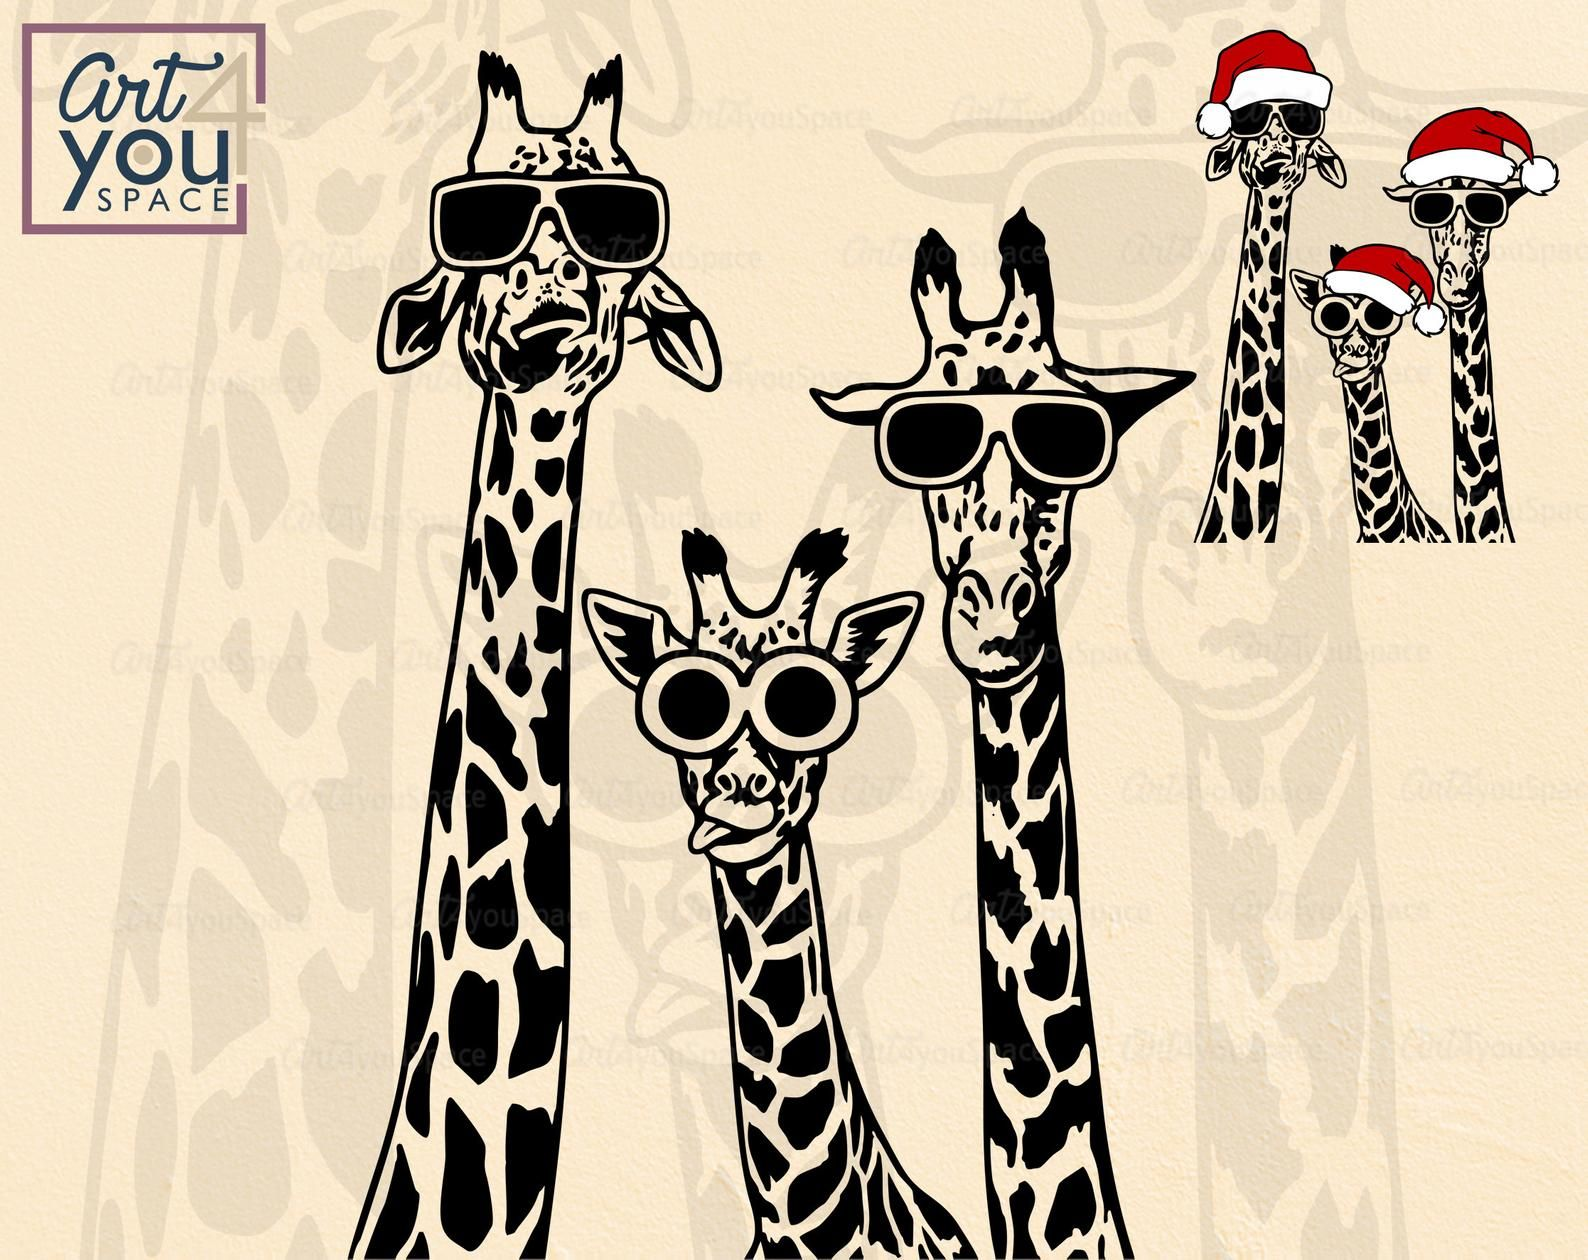 Giraffe Svg Funny Giraffes With Glasses African Safari Etsy In 2021 Funny Giraffe Giraffe African Safari